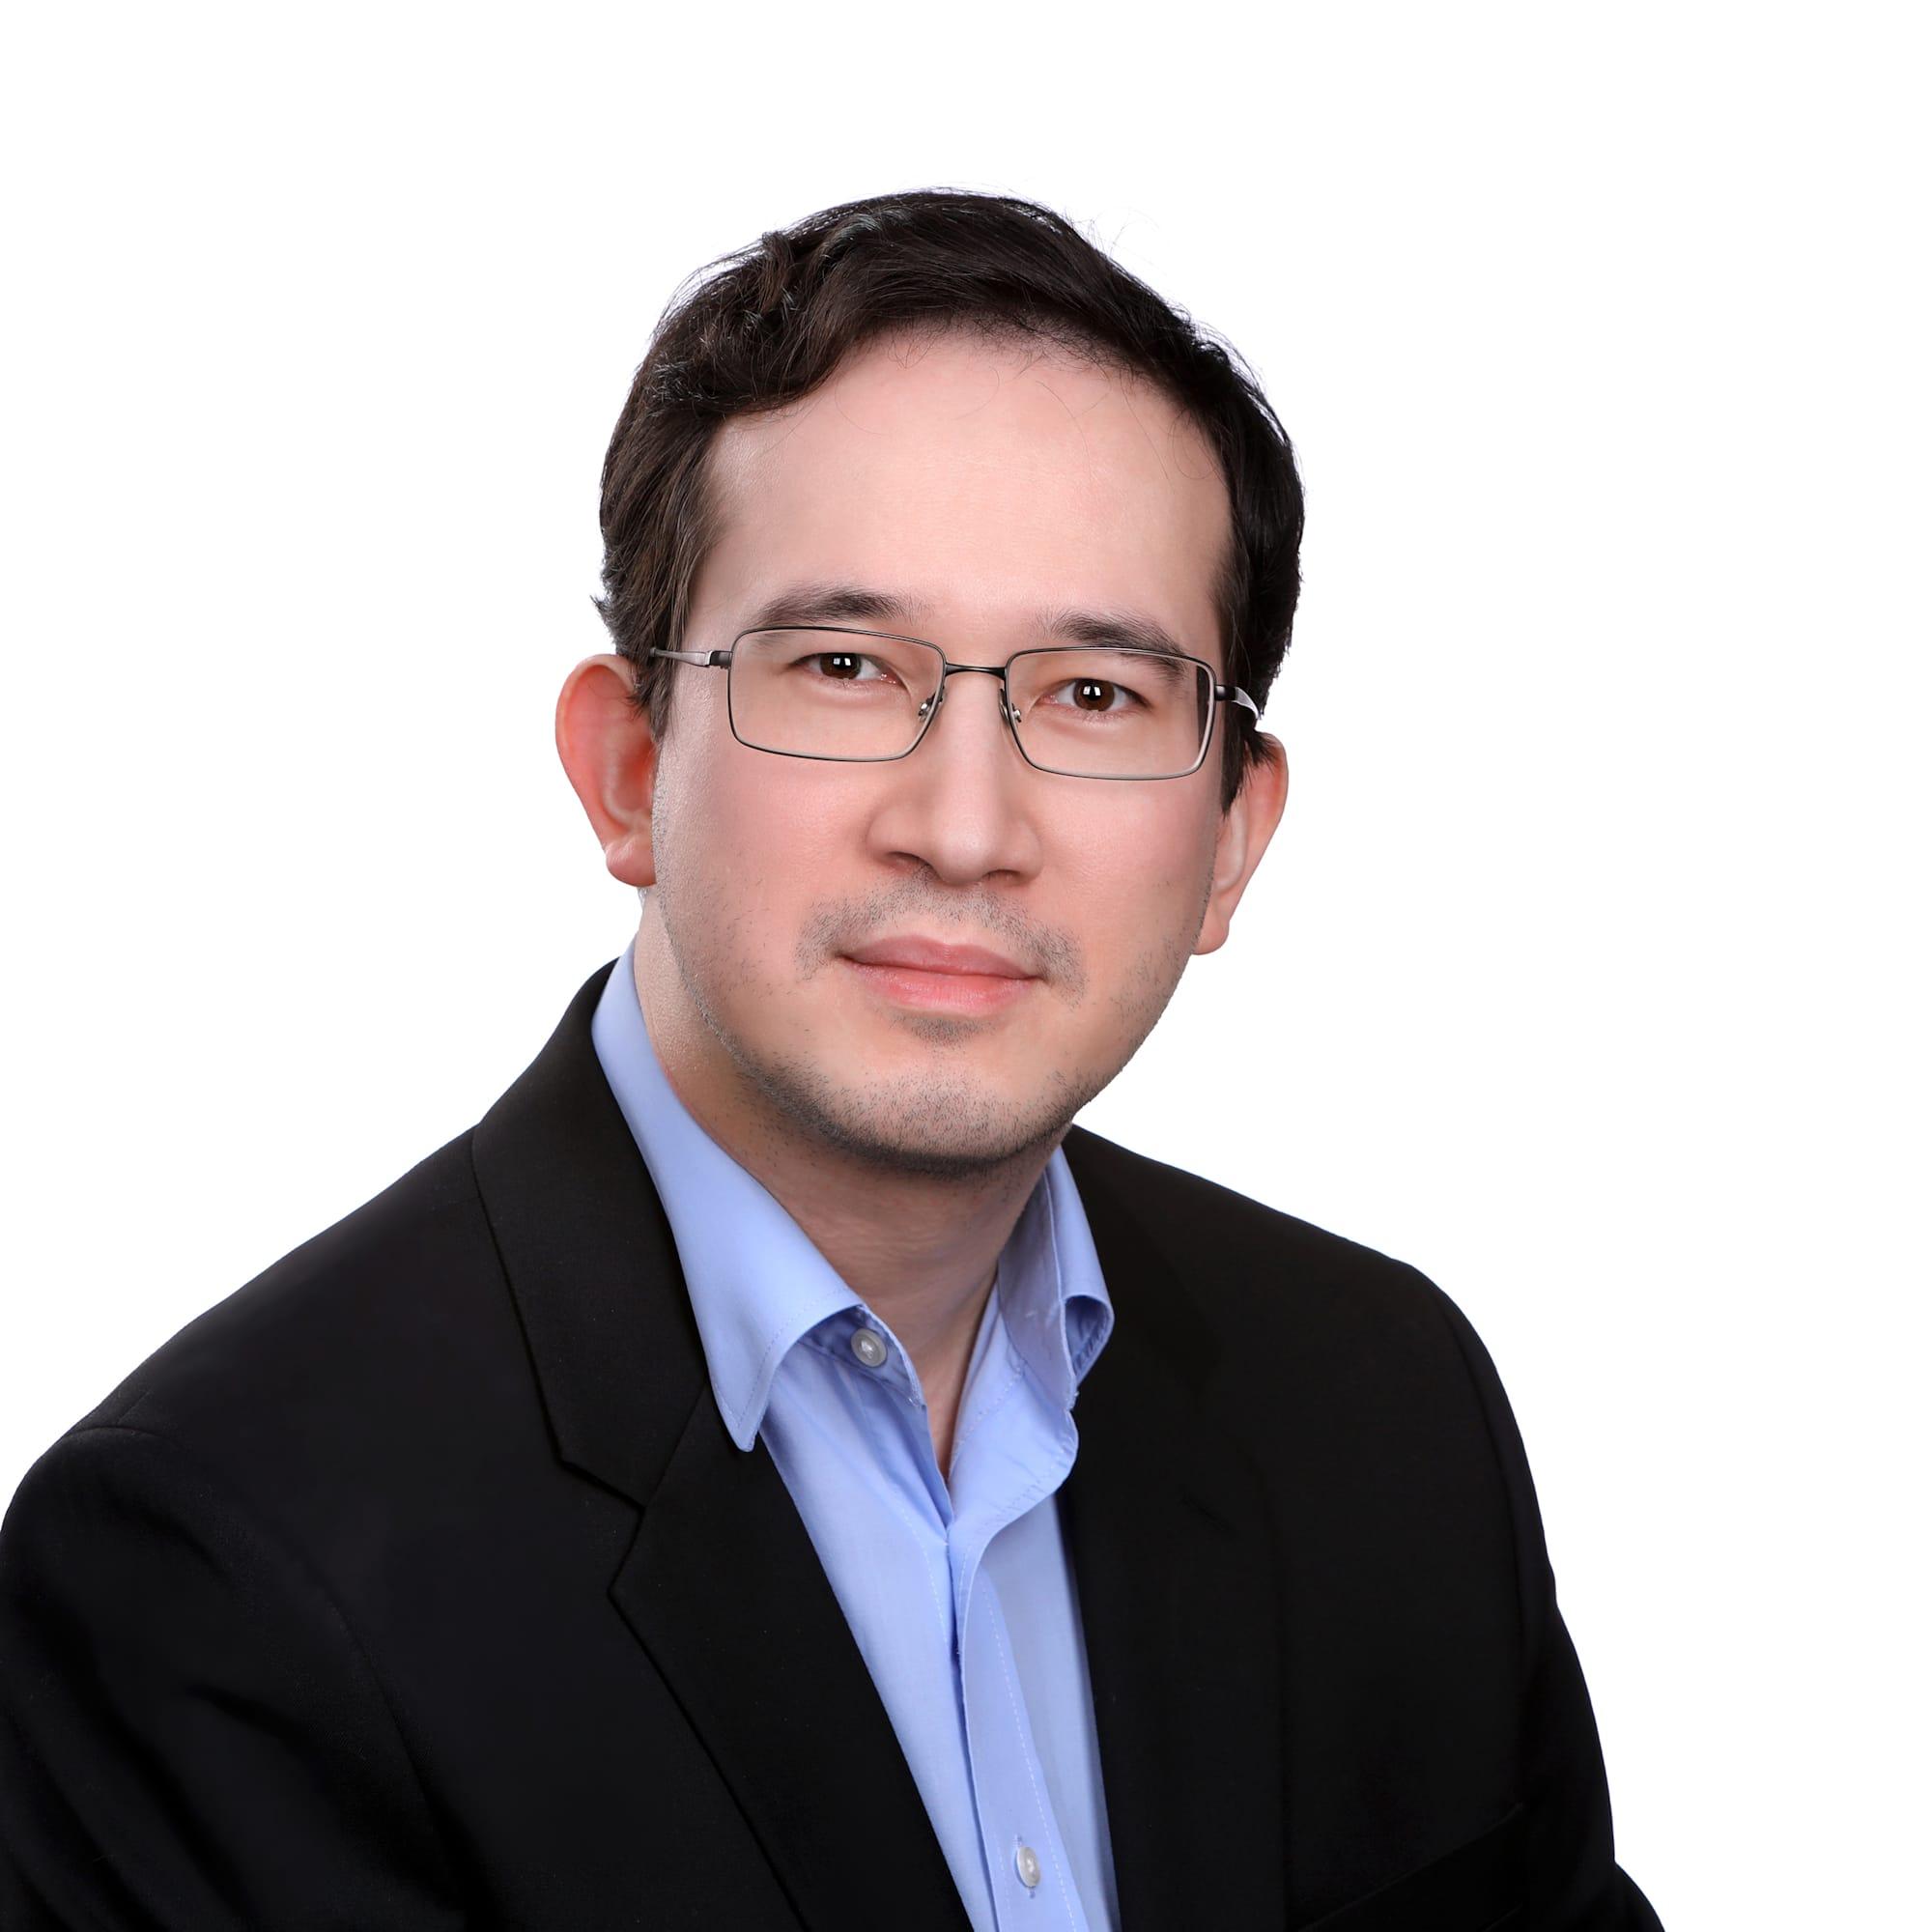 The speaker Paul Lanois's profile image